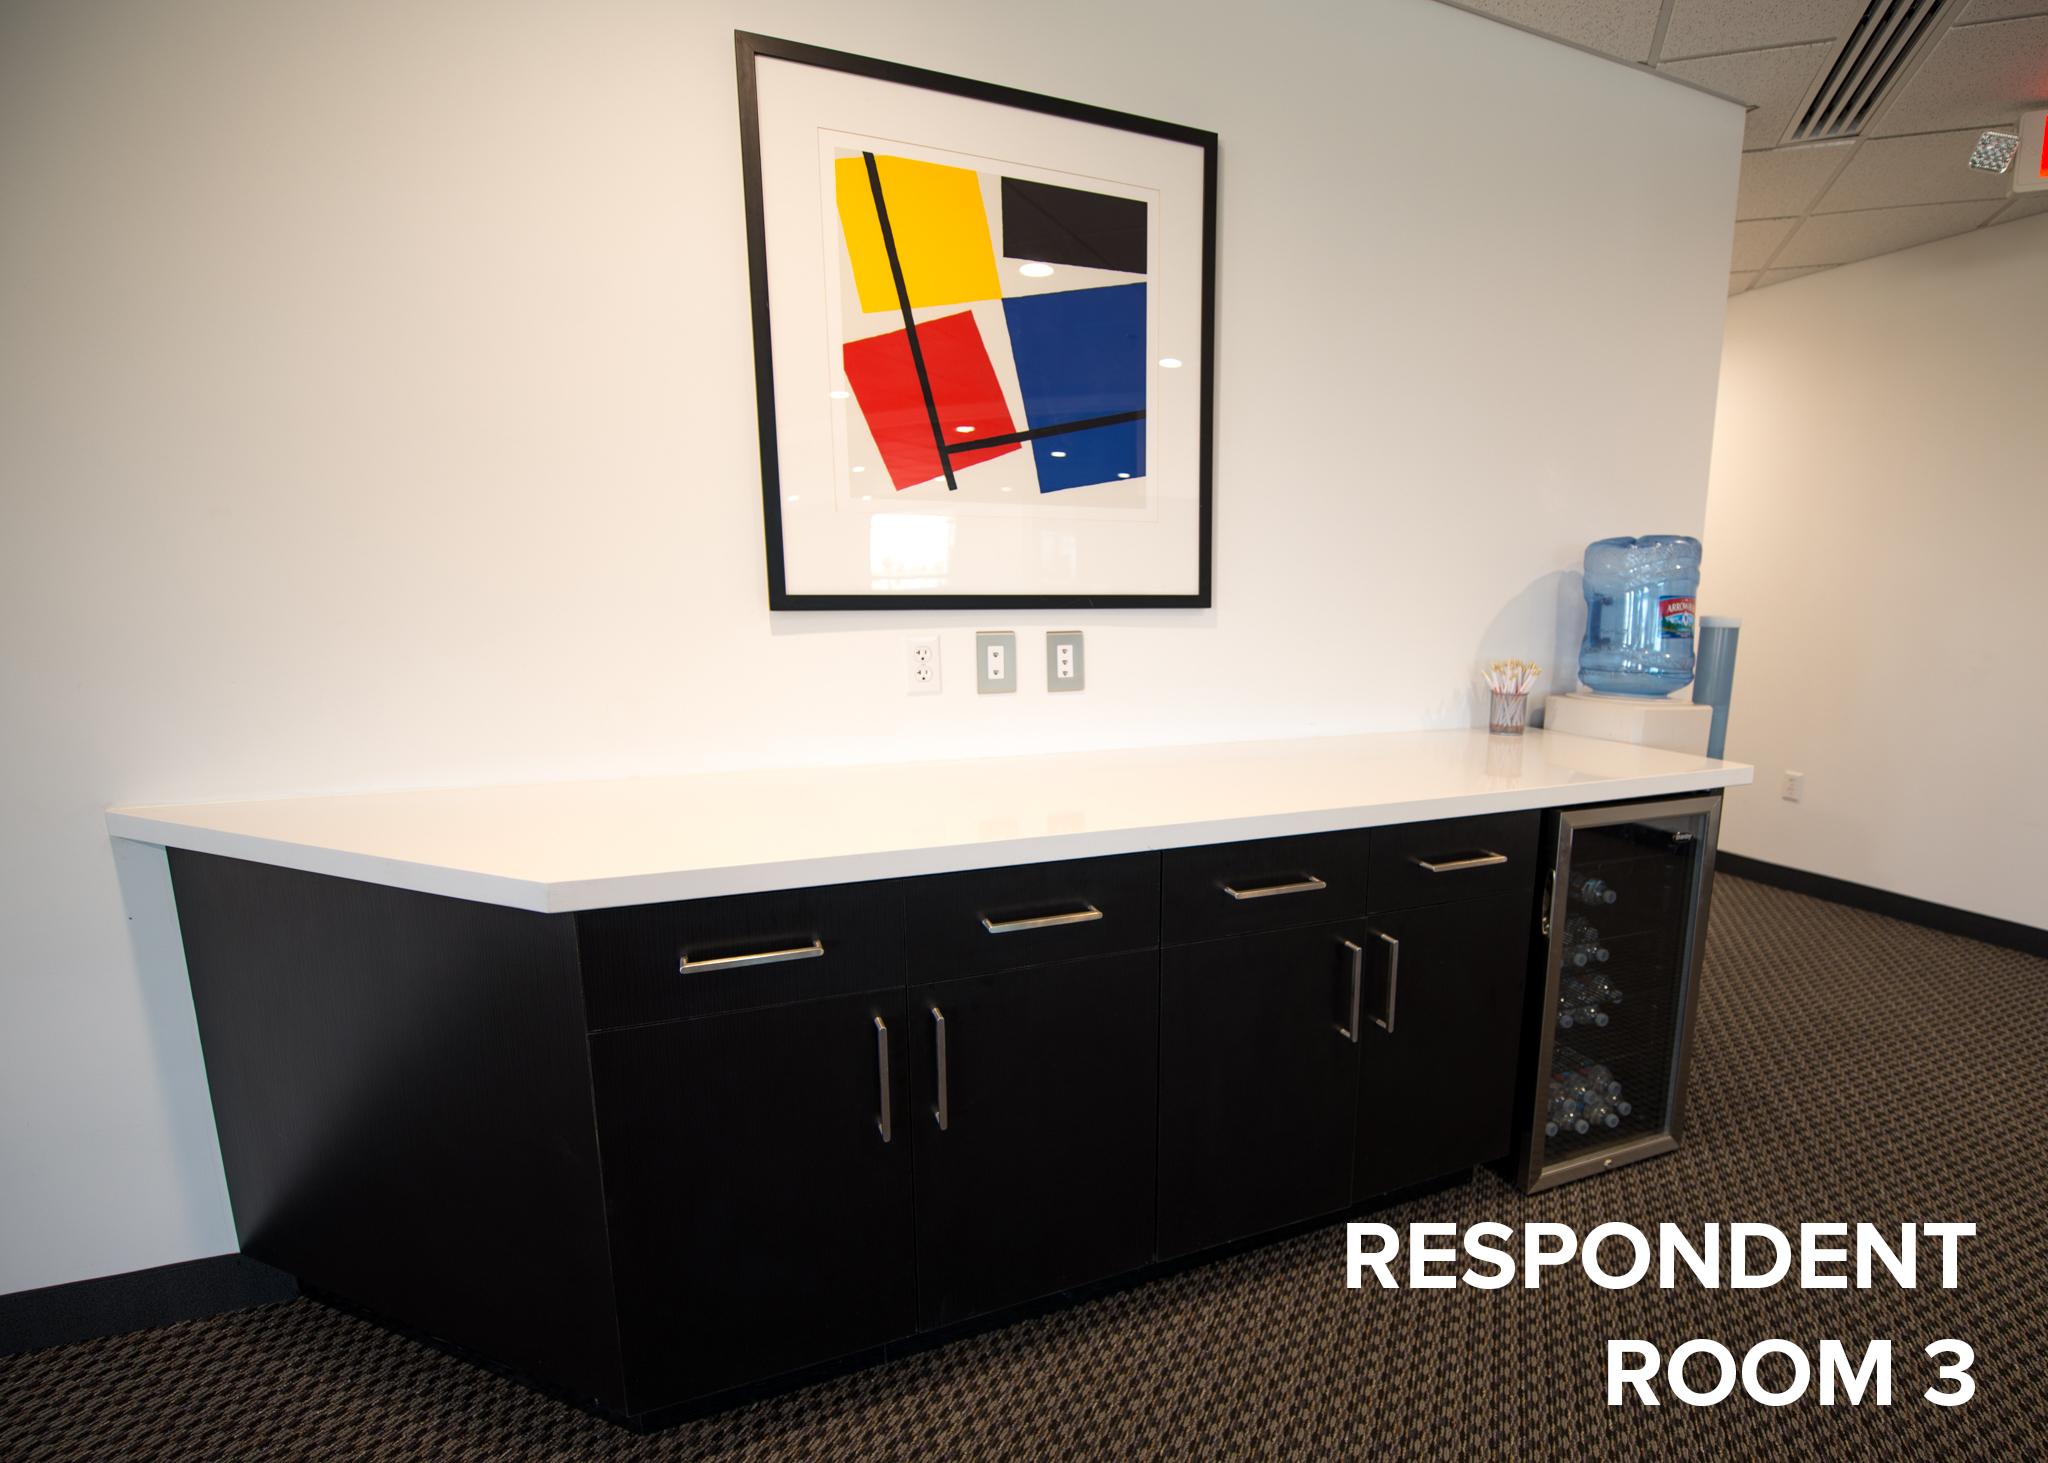 Respondent Room 3.jpg